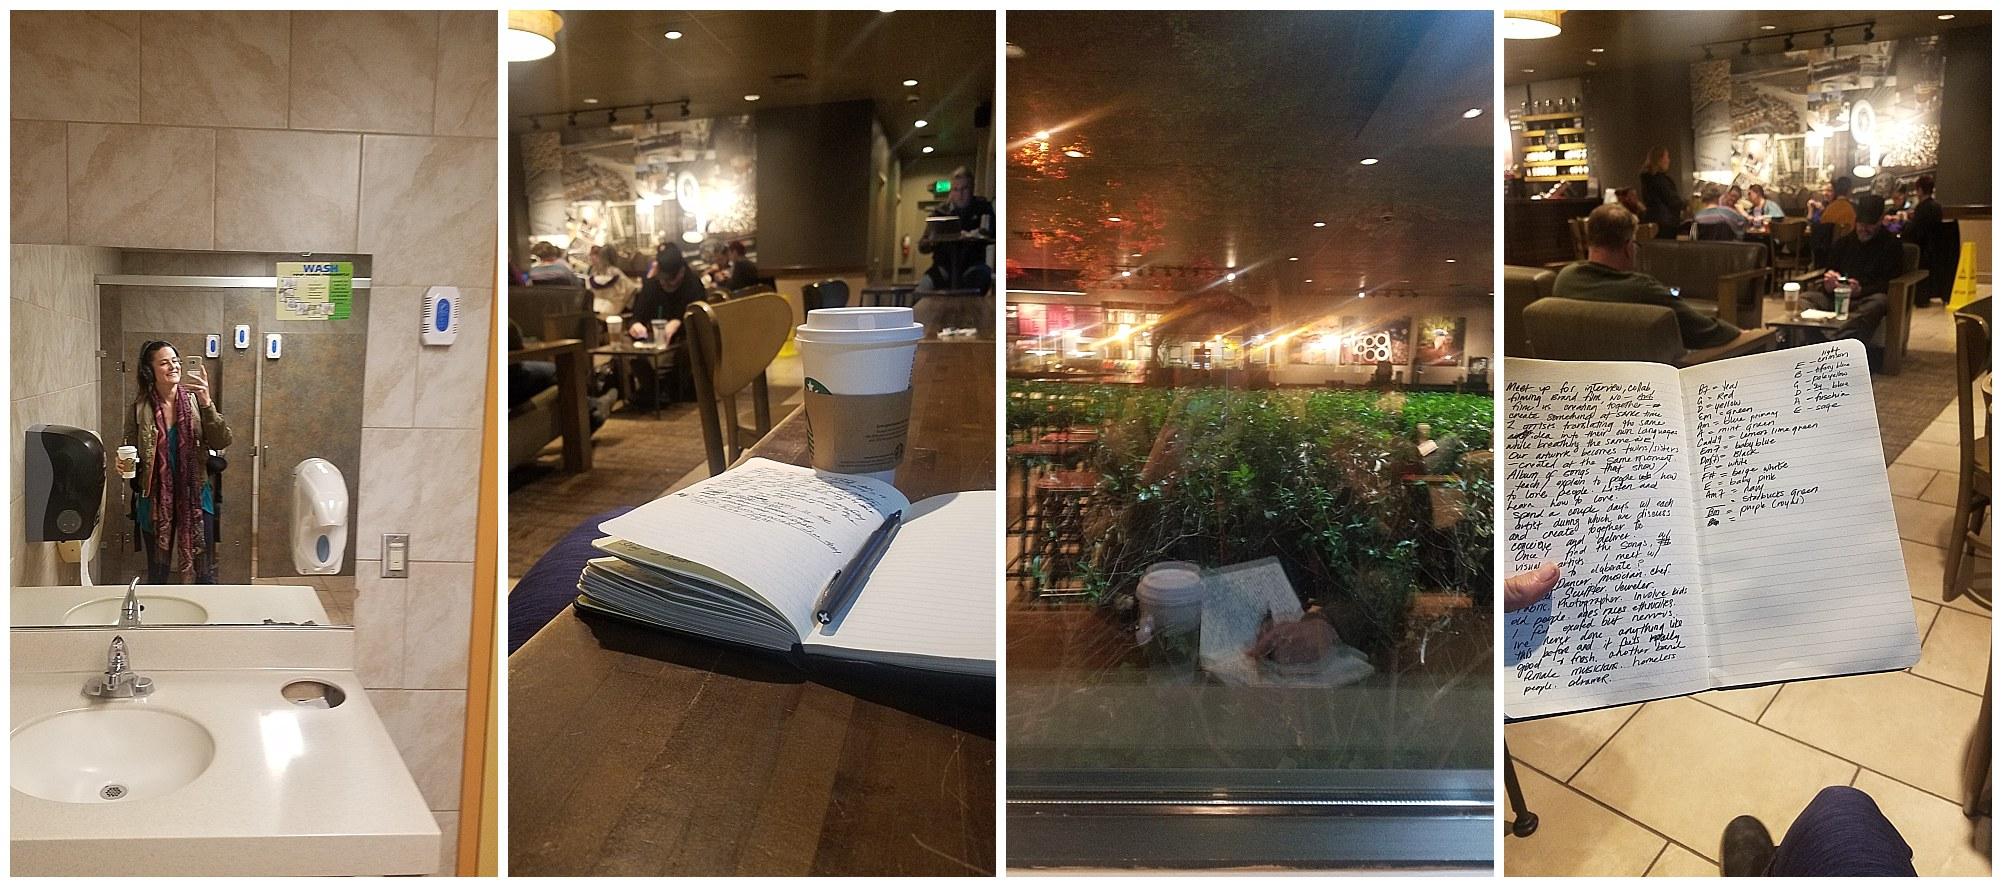 cha wilde - journaling in starbucks coffeeshop